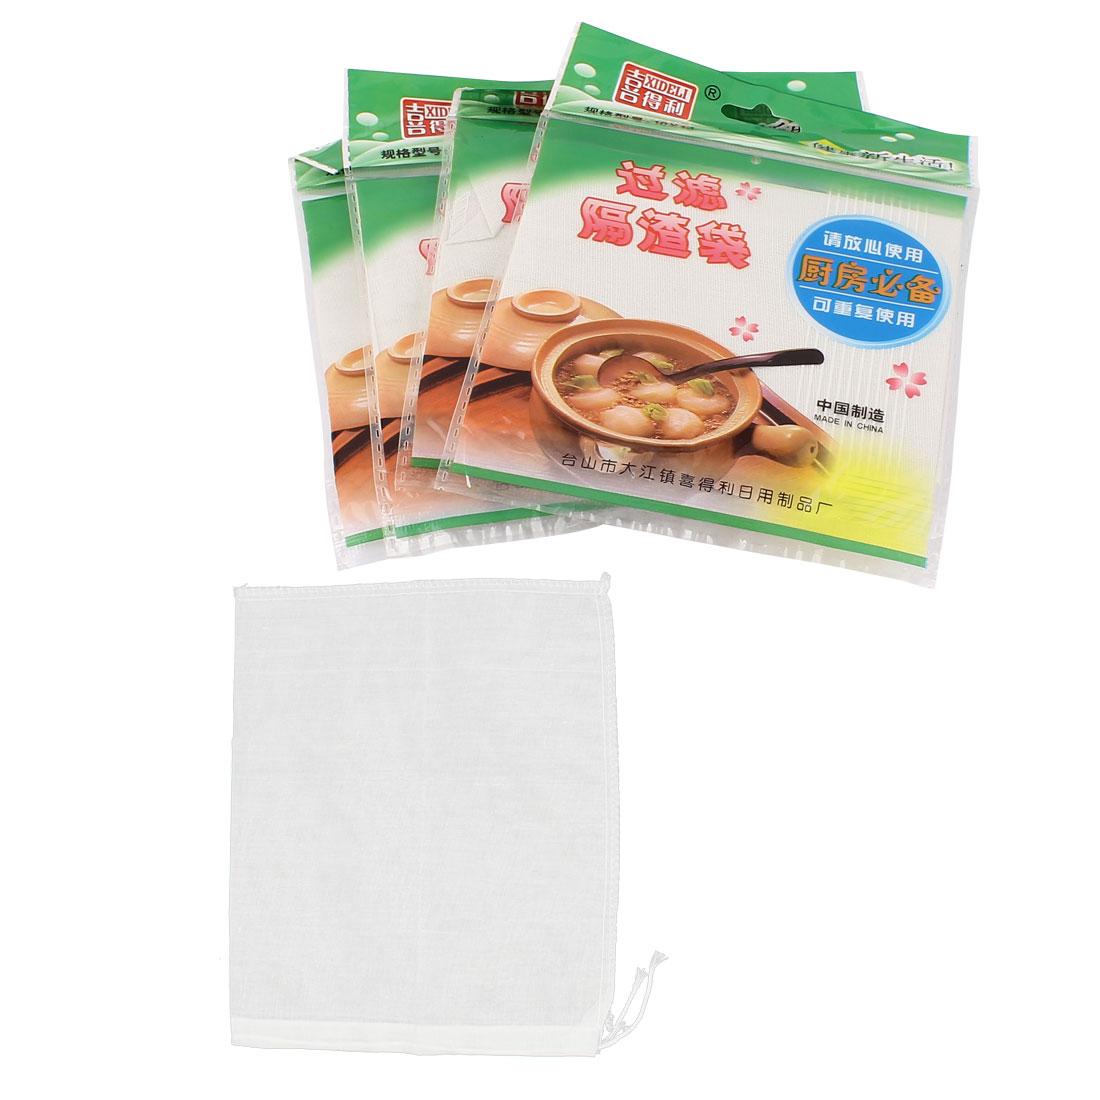 5 Pcs Drawstring Seal Soup Food Strainer Filter Mesh Bag 27cm x 24cm White